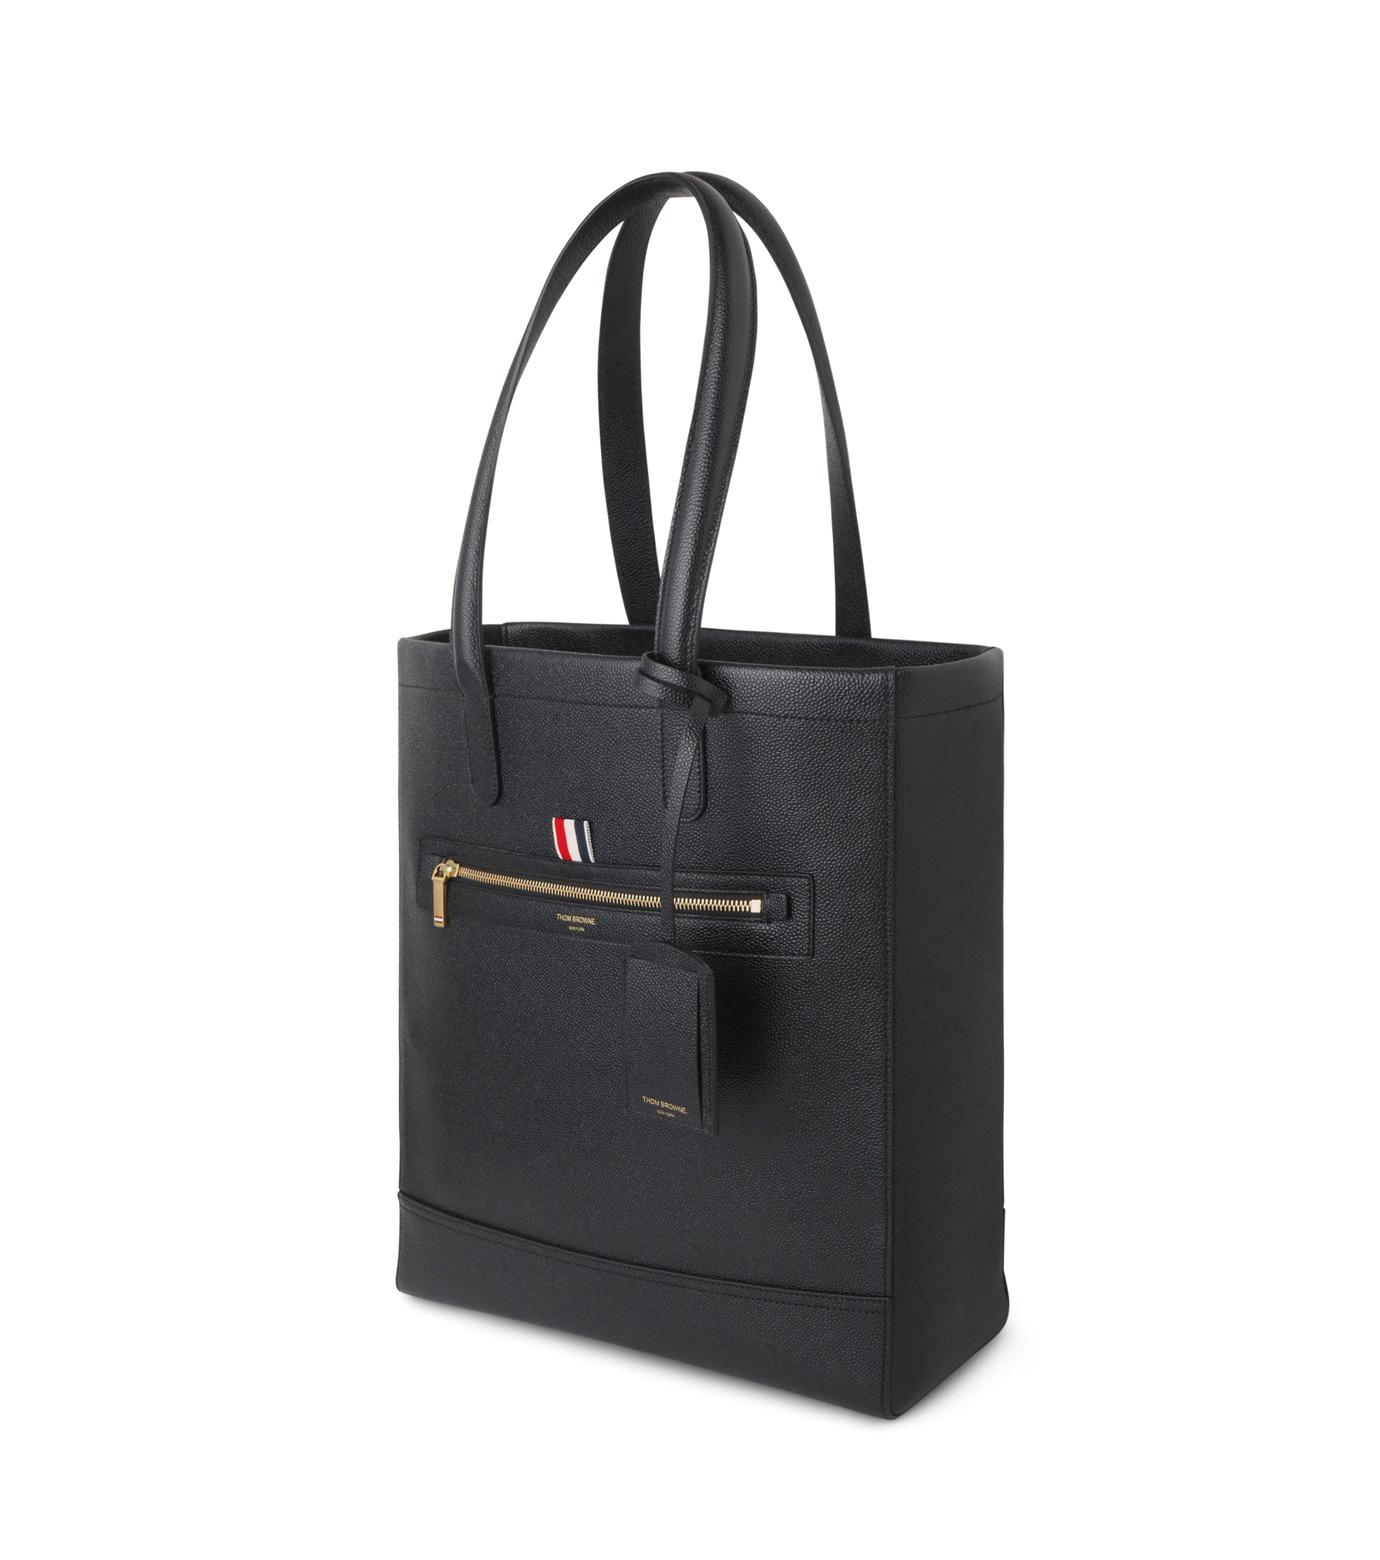 Thom Browne(トムブラウン)のLeather Tote-BLACK(ハンドバッグ/hand bag)-MAG059A00198-13 拡大詳細画像2